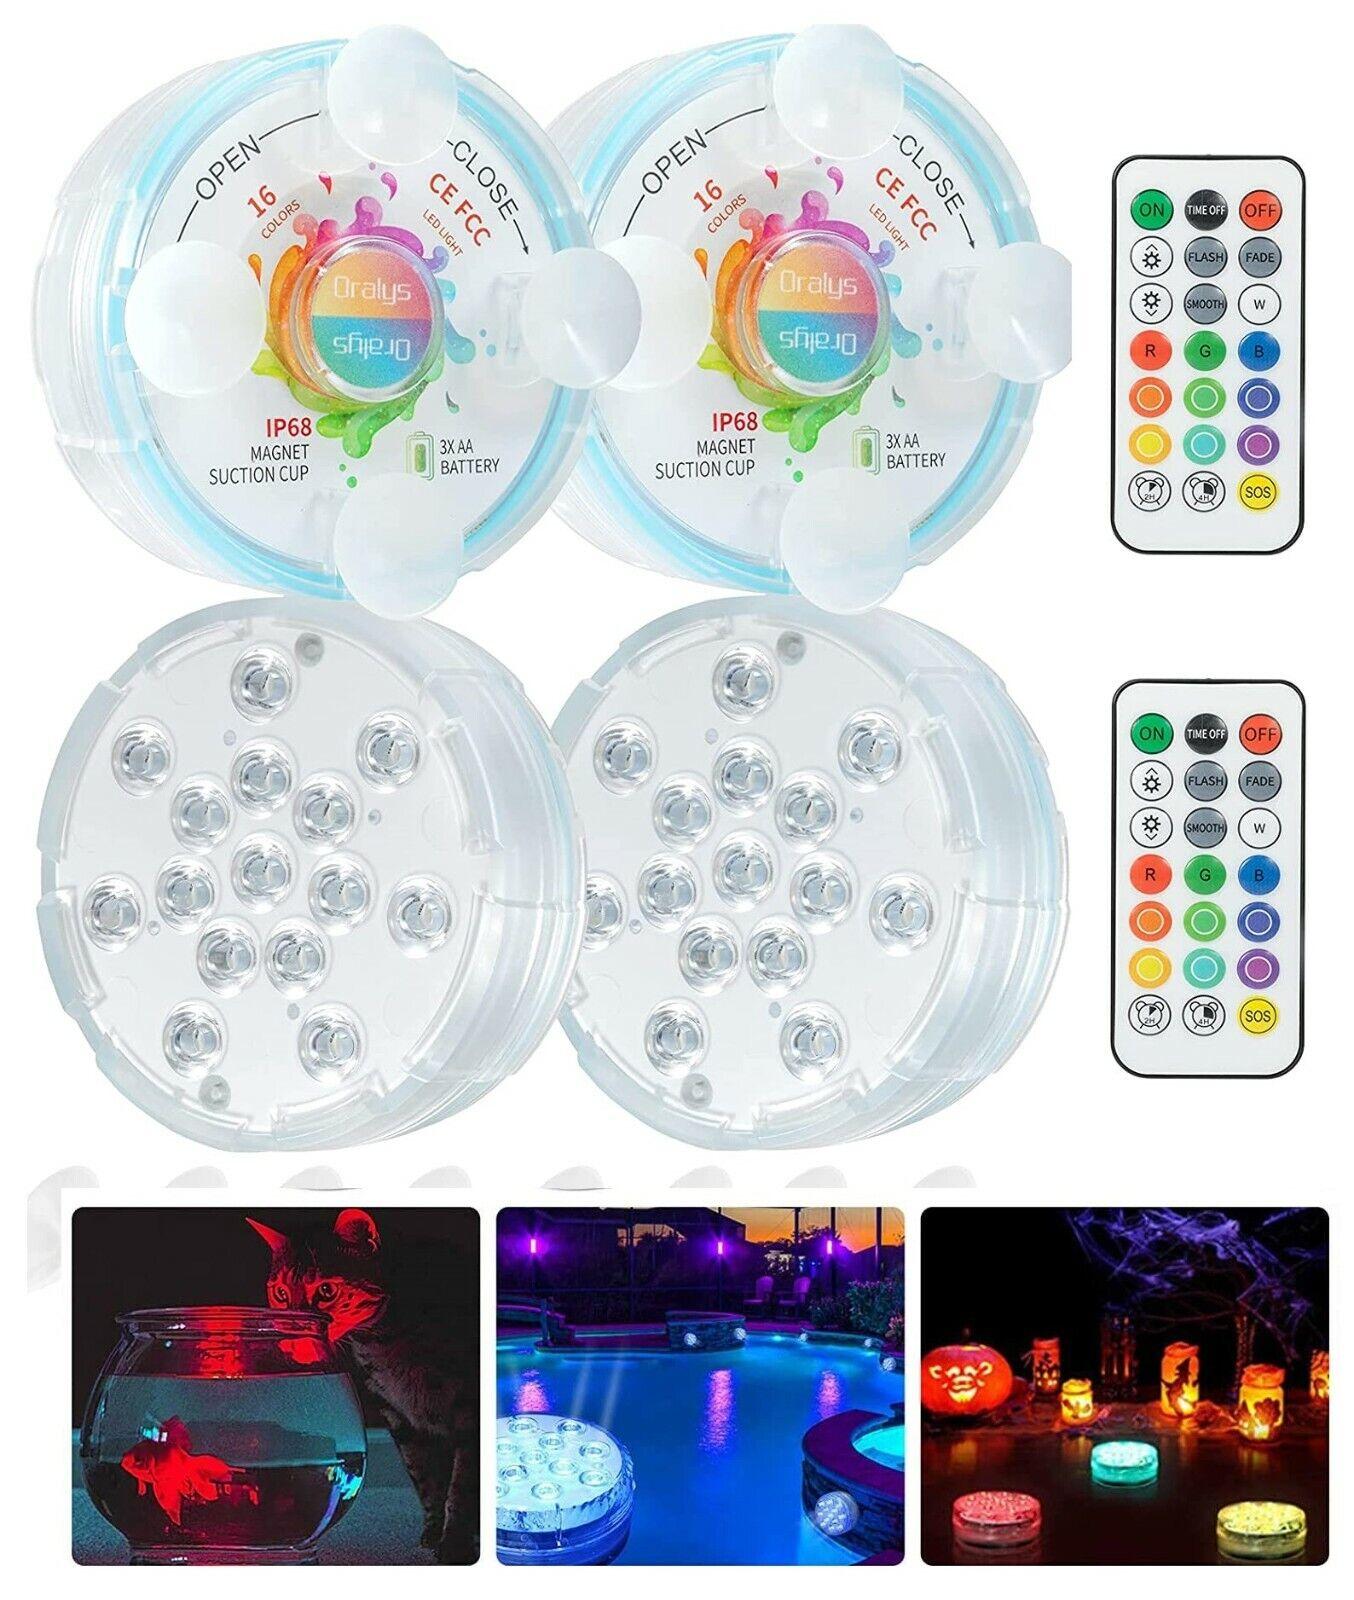 4 Underwater RGB 15 LED Lights Waterproof IP68 Hot Tub Bath Pool Pond Tank Timer